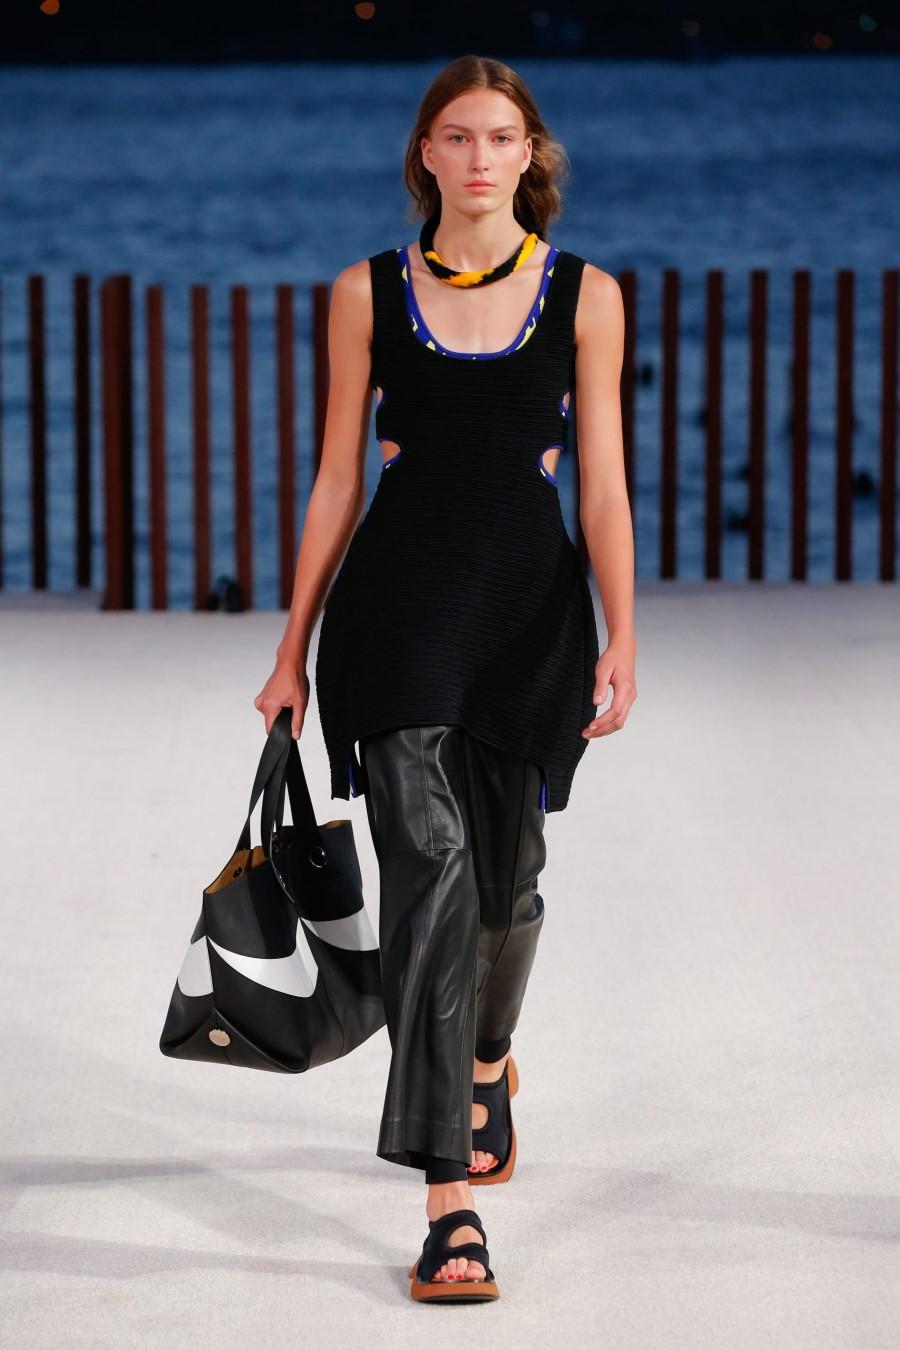 Proenza Schouler Spring Summer 2022 - New York Fashion Week